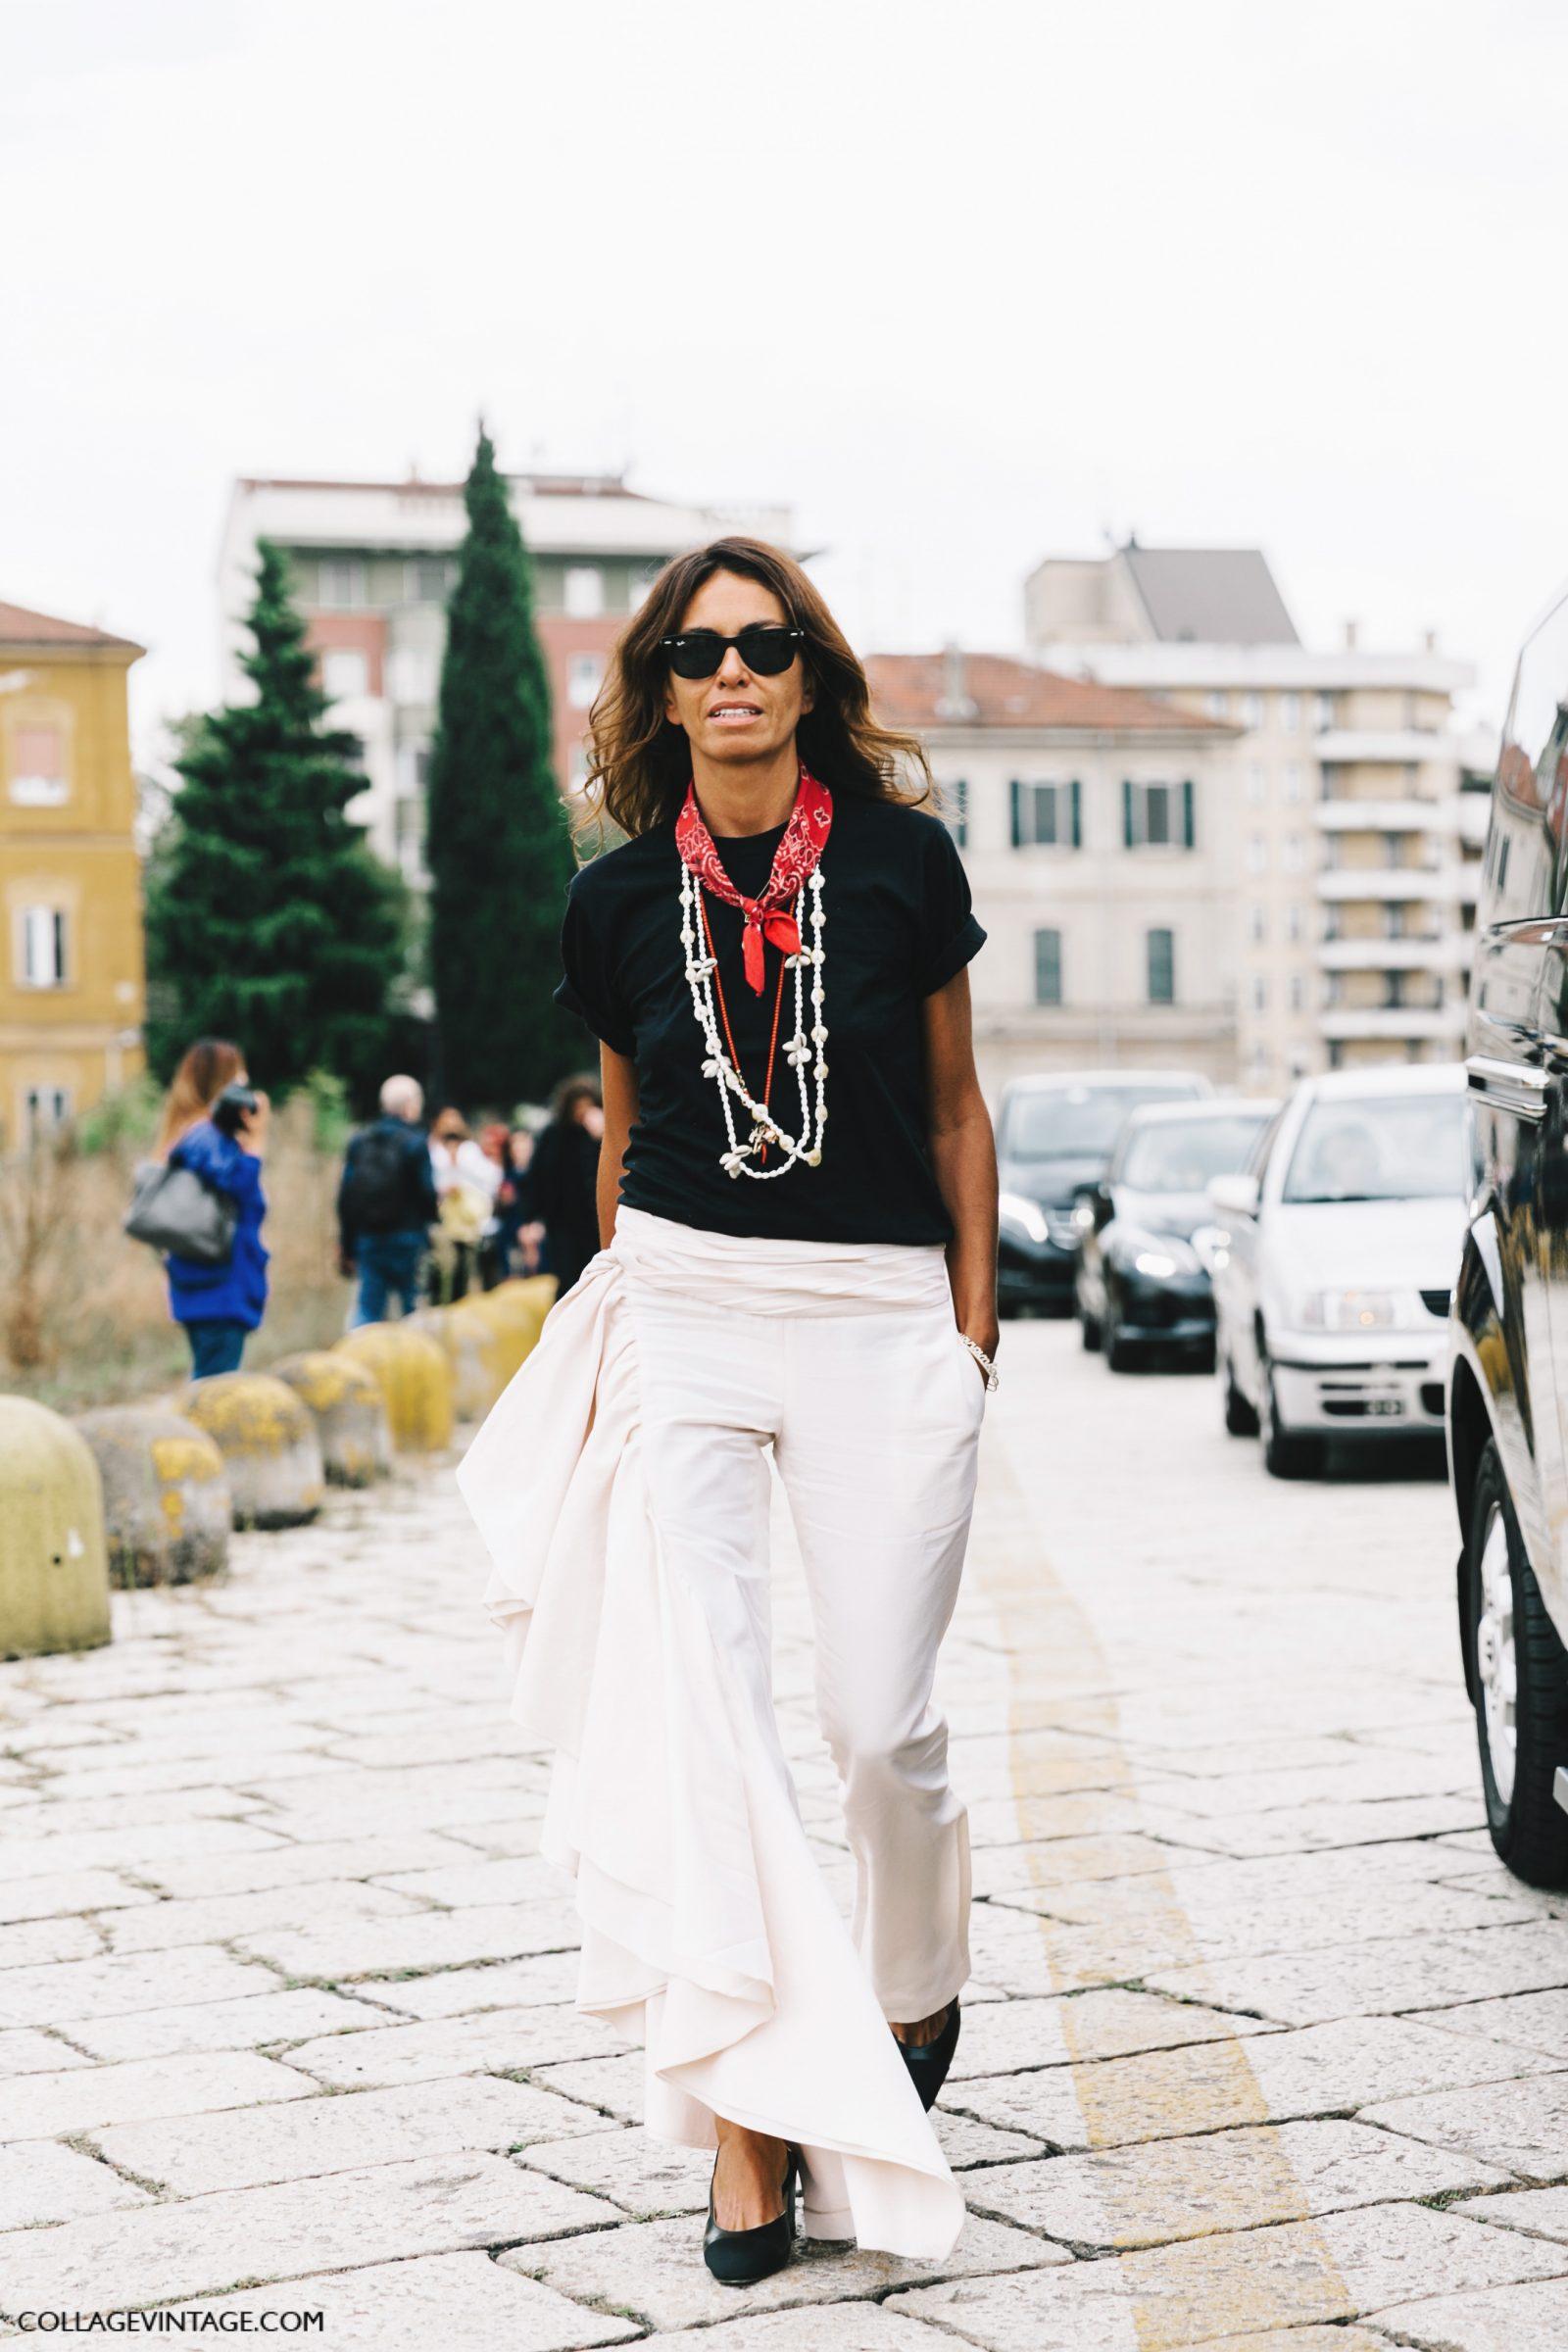 mfw-milan_fashion_week_ss17-street_style-outfits-collage_vintage-gucci-numero_21-alberta_ferreti-3